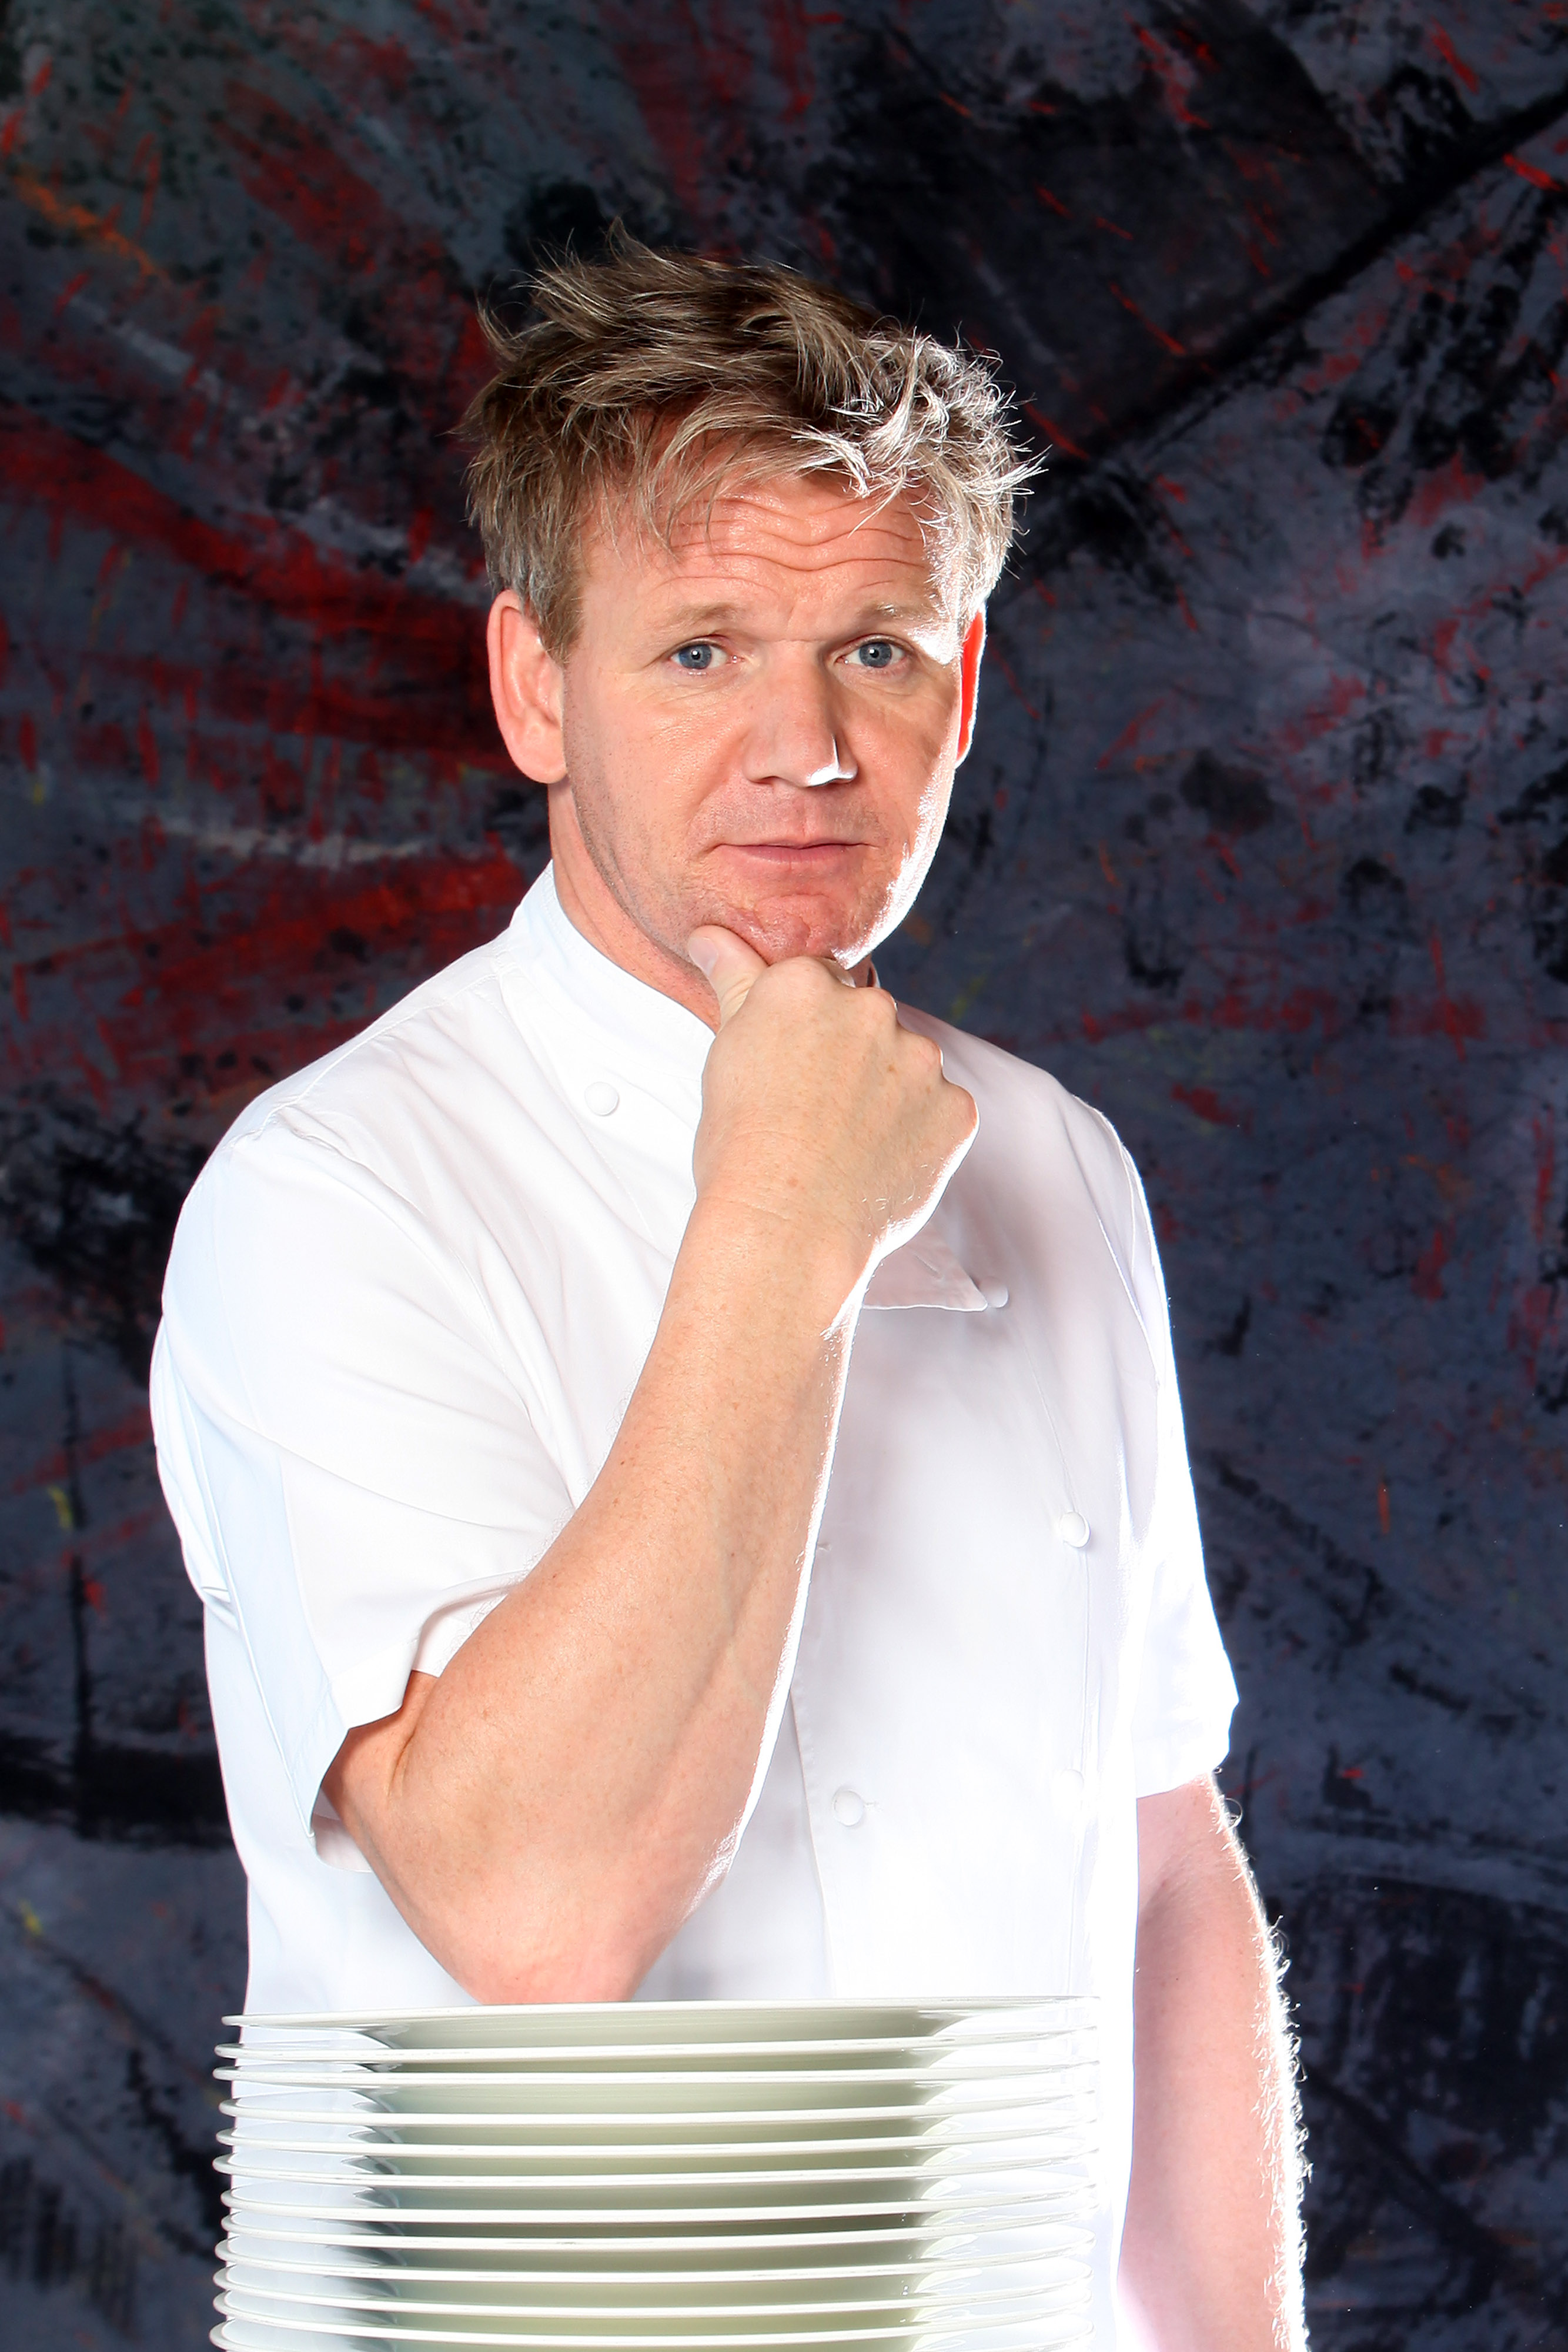 Gordon Ramsay Wallpaper